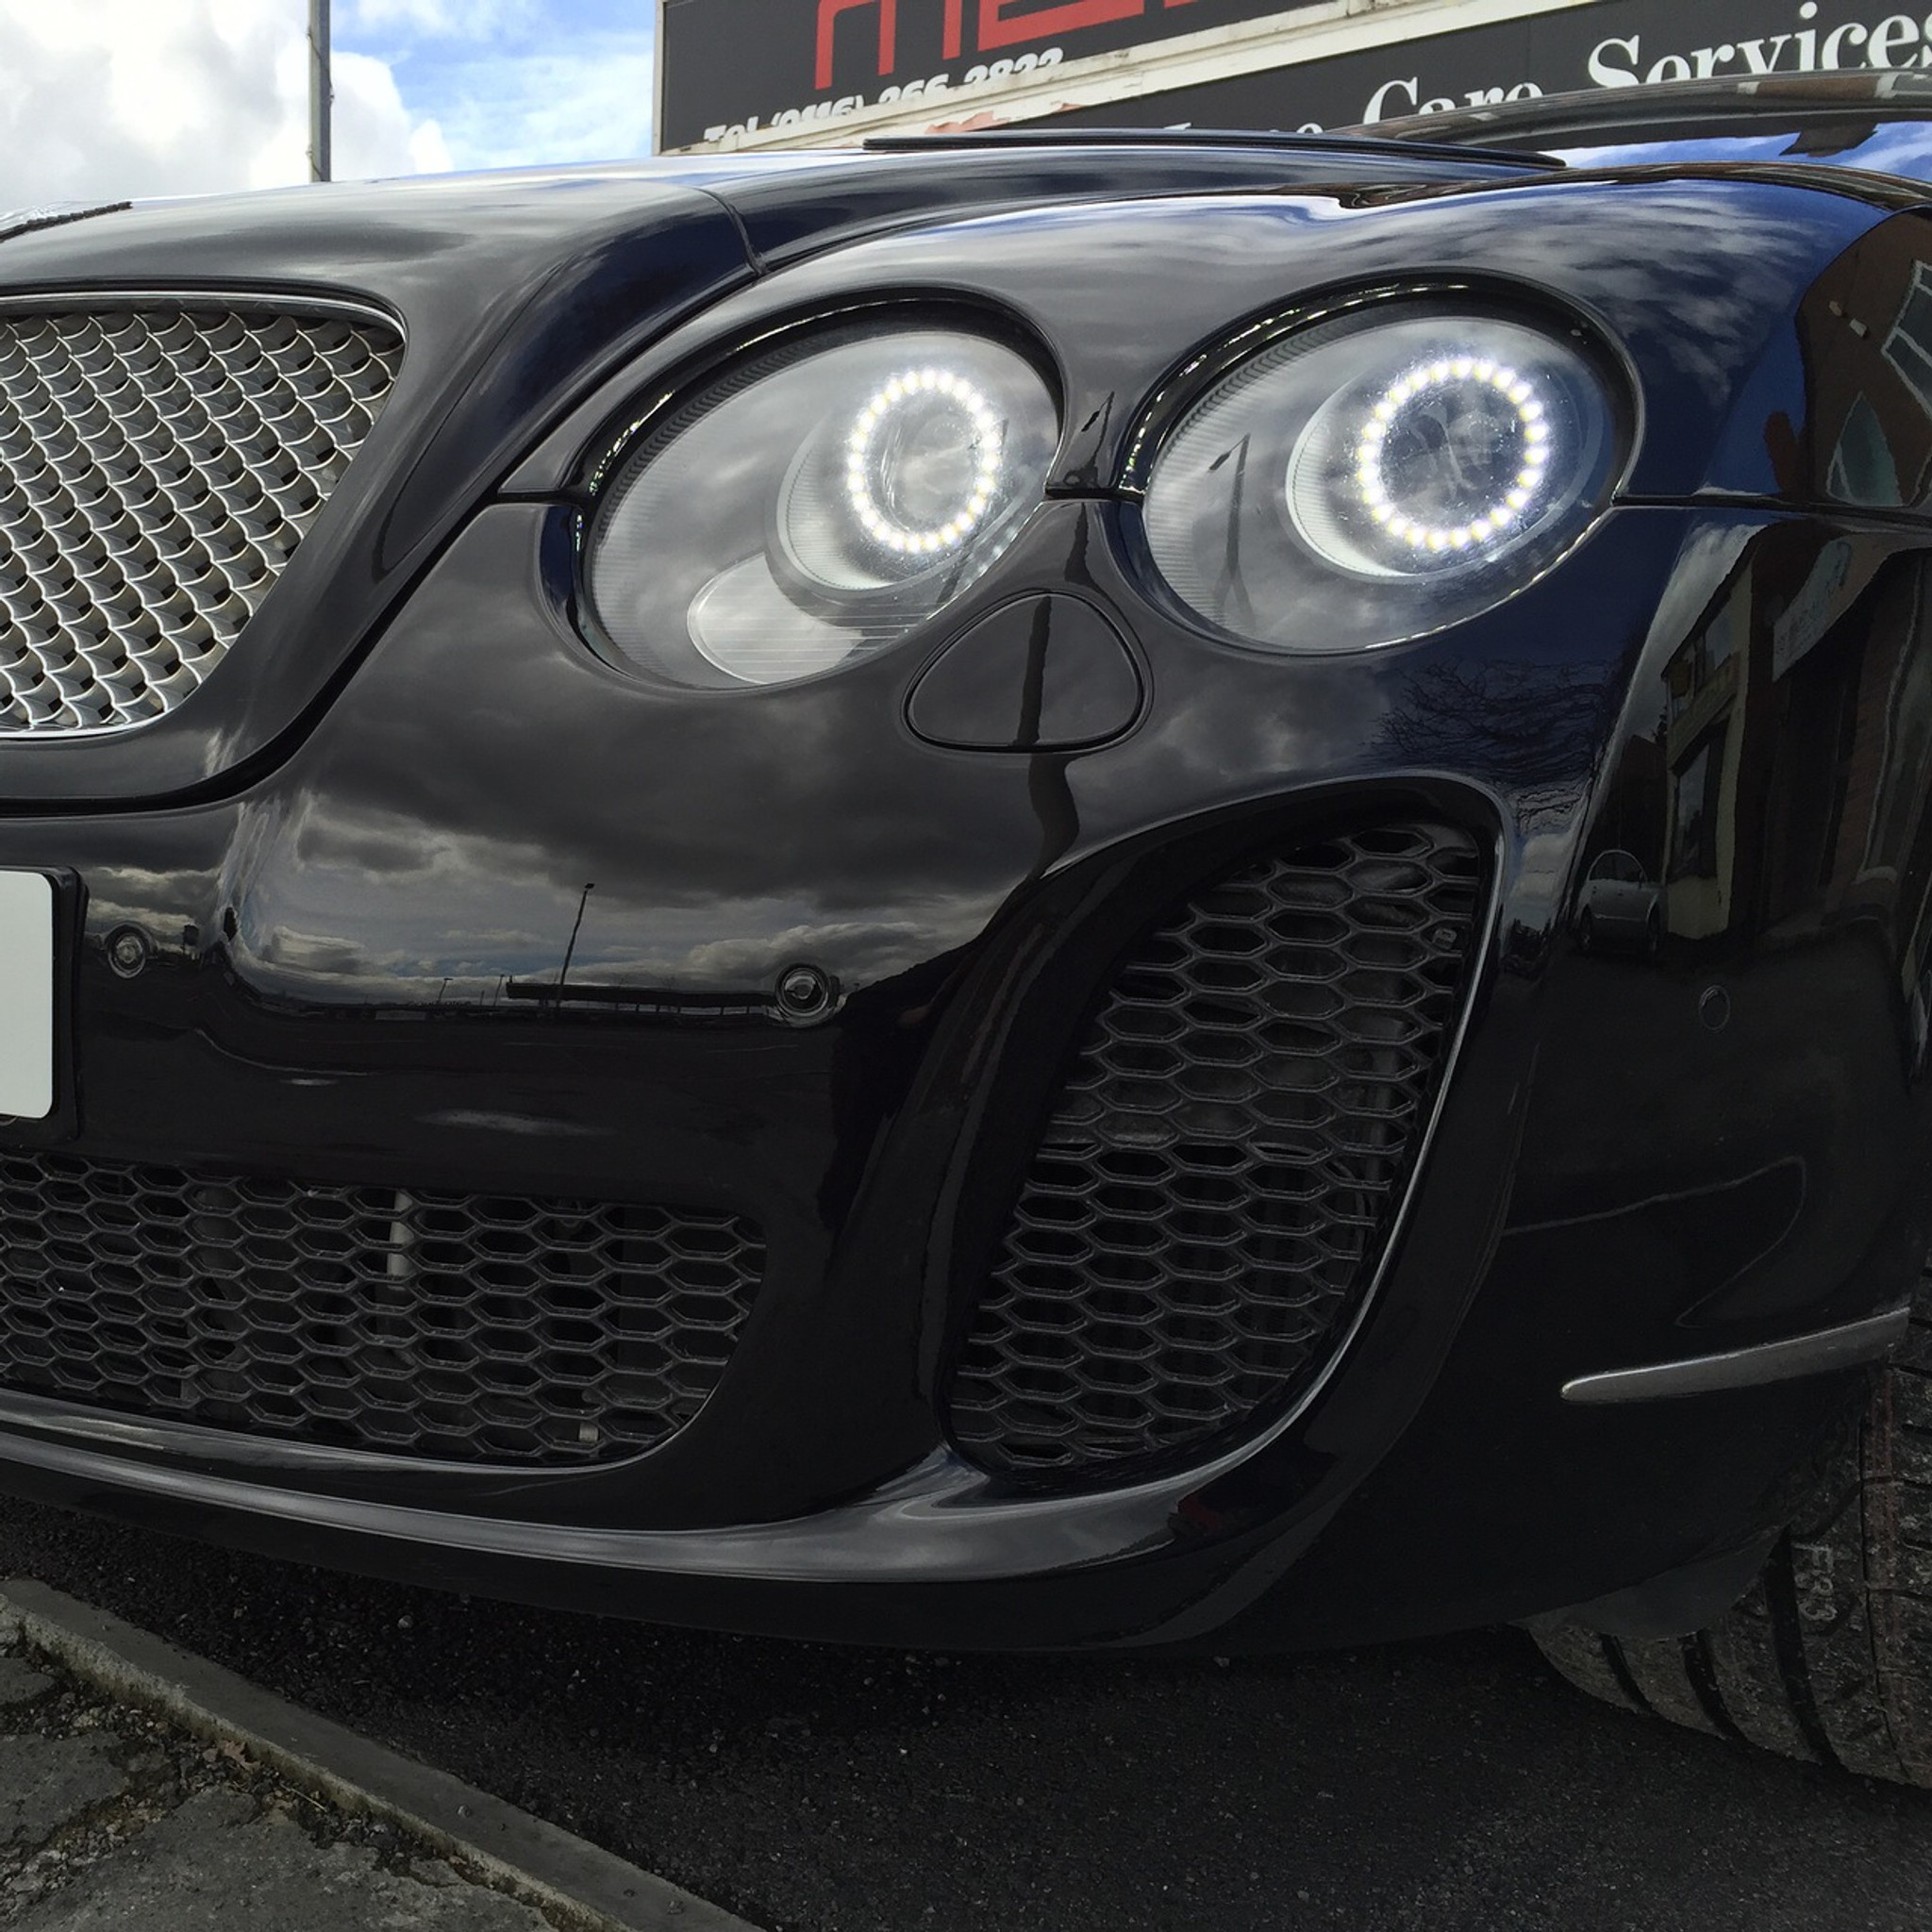 Bentley Continental GT/GTC Supersport Conversion Bodykit